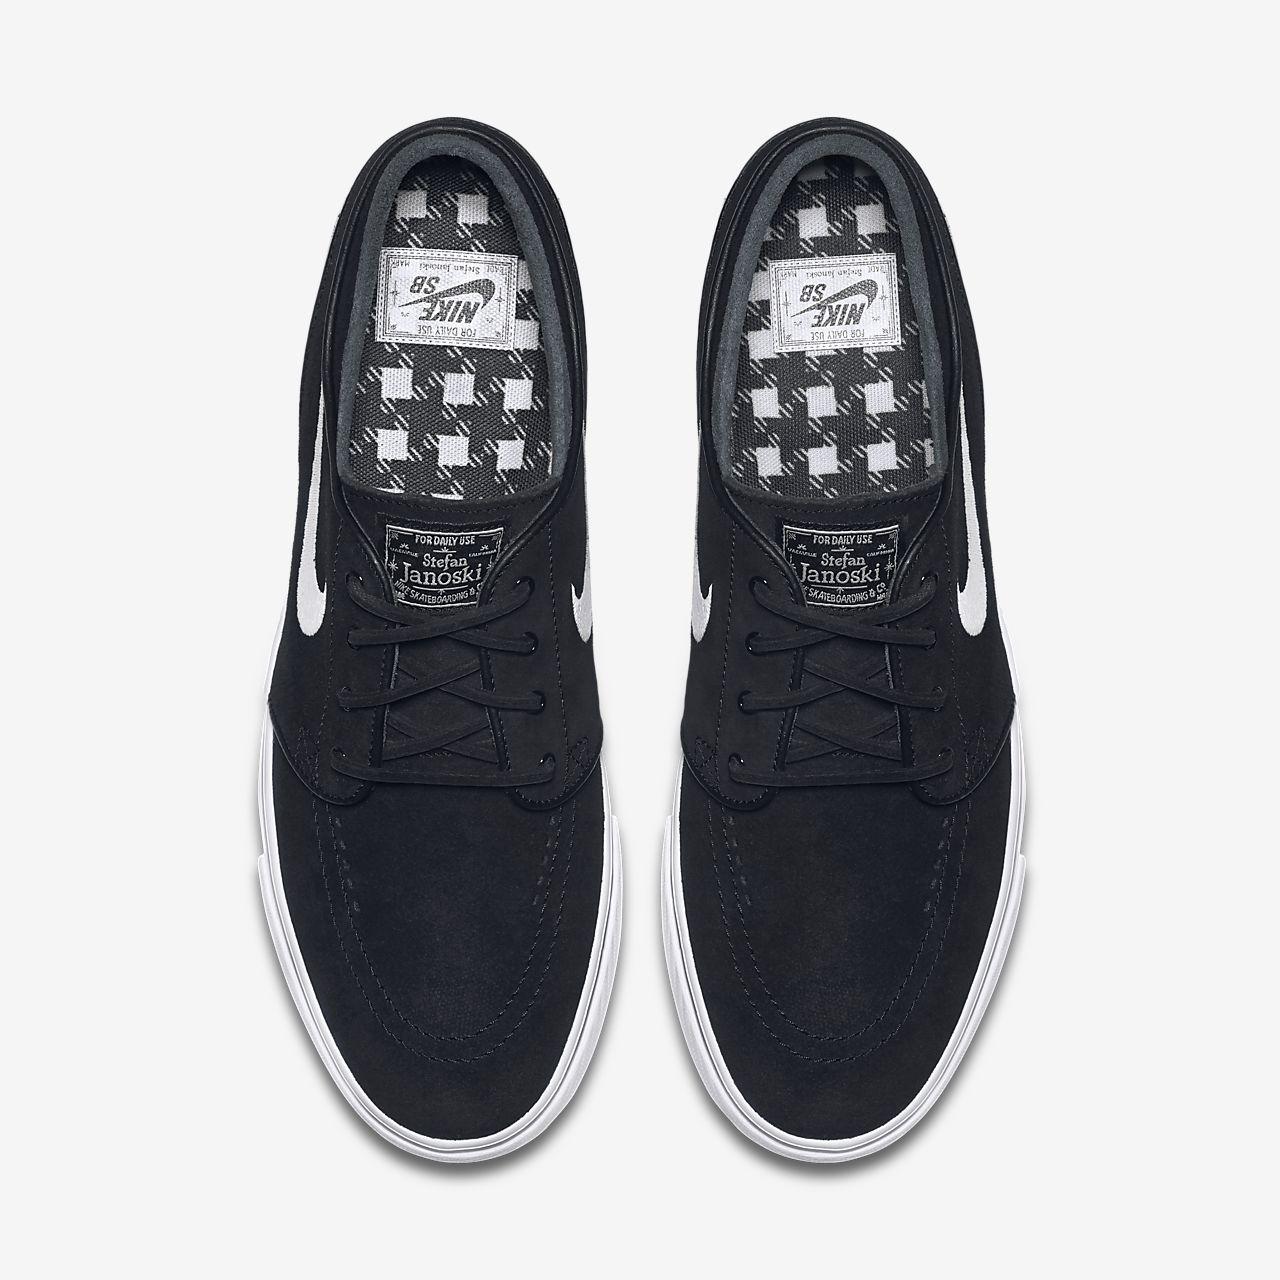 Nike Sb Zoom Stefan Janoski Y Negro falsa venta barata 5JZrkOJj